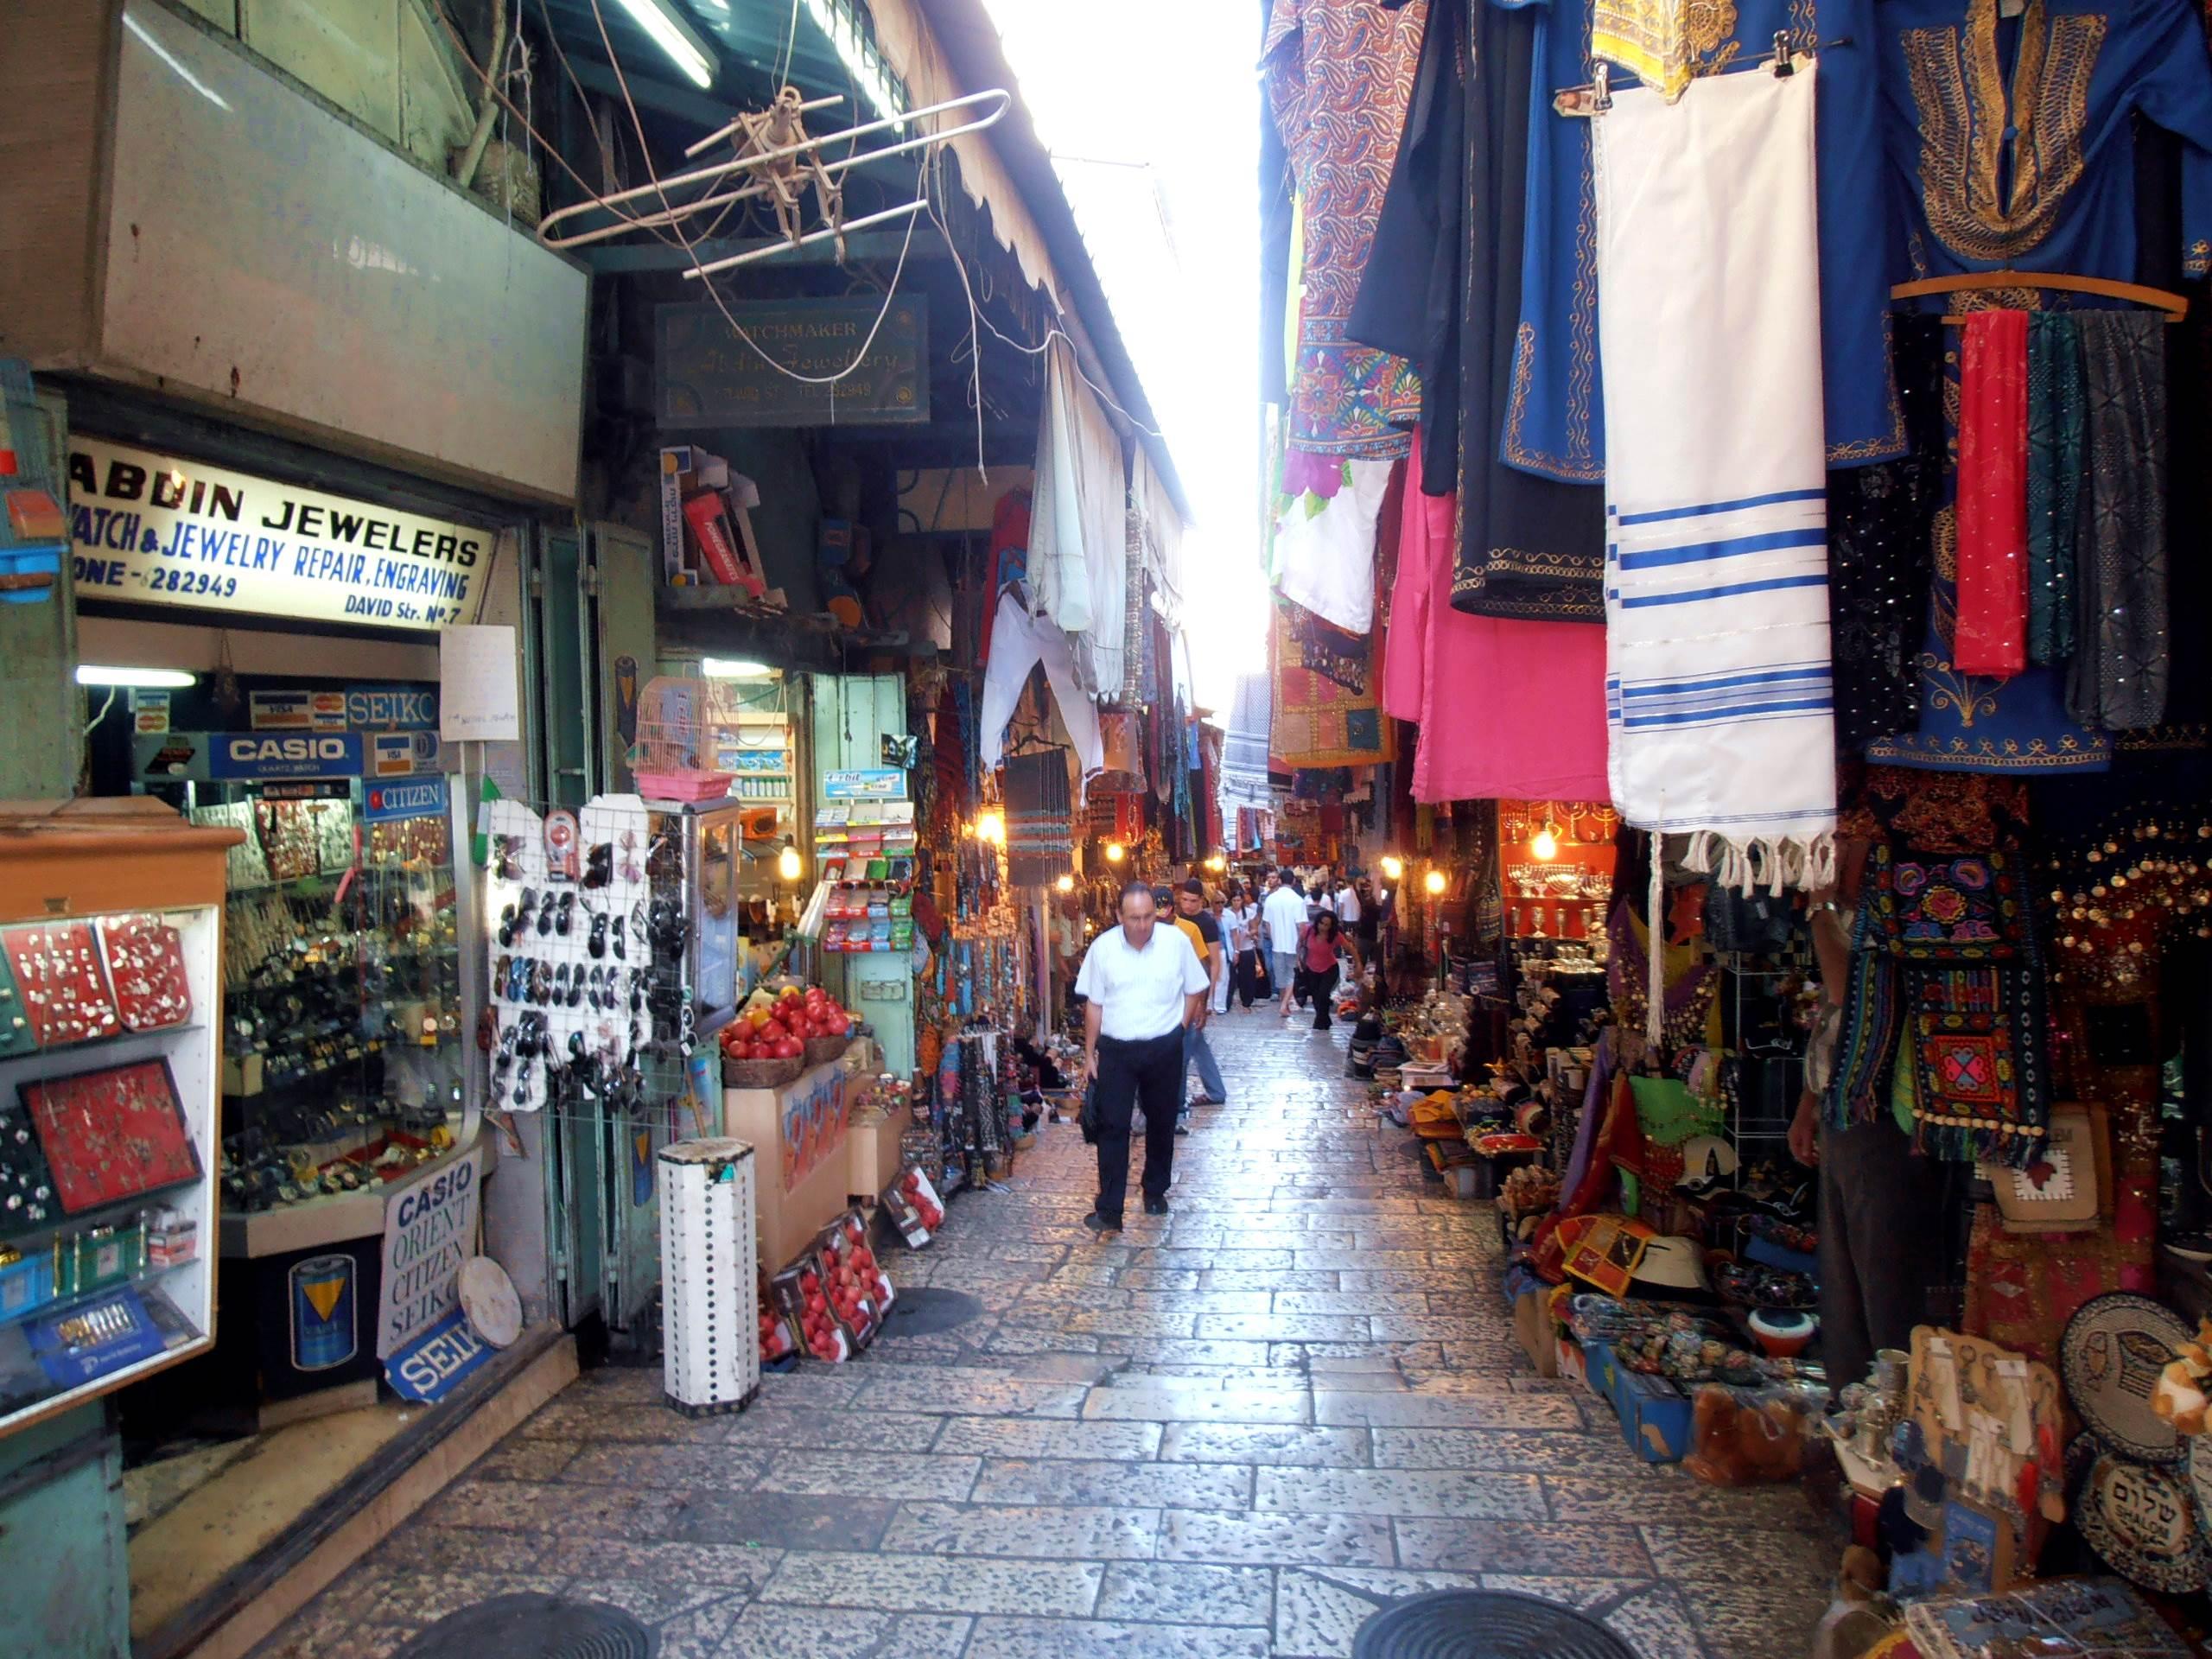 jerusalem_israel_cidadevelha_bairrocrist